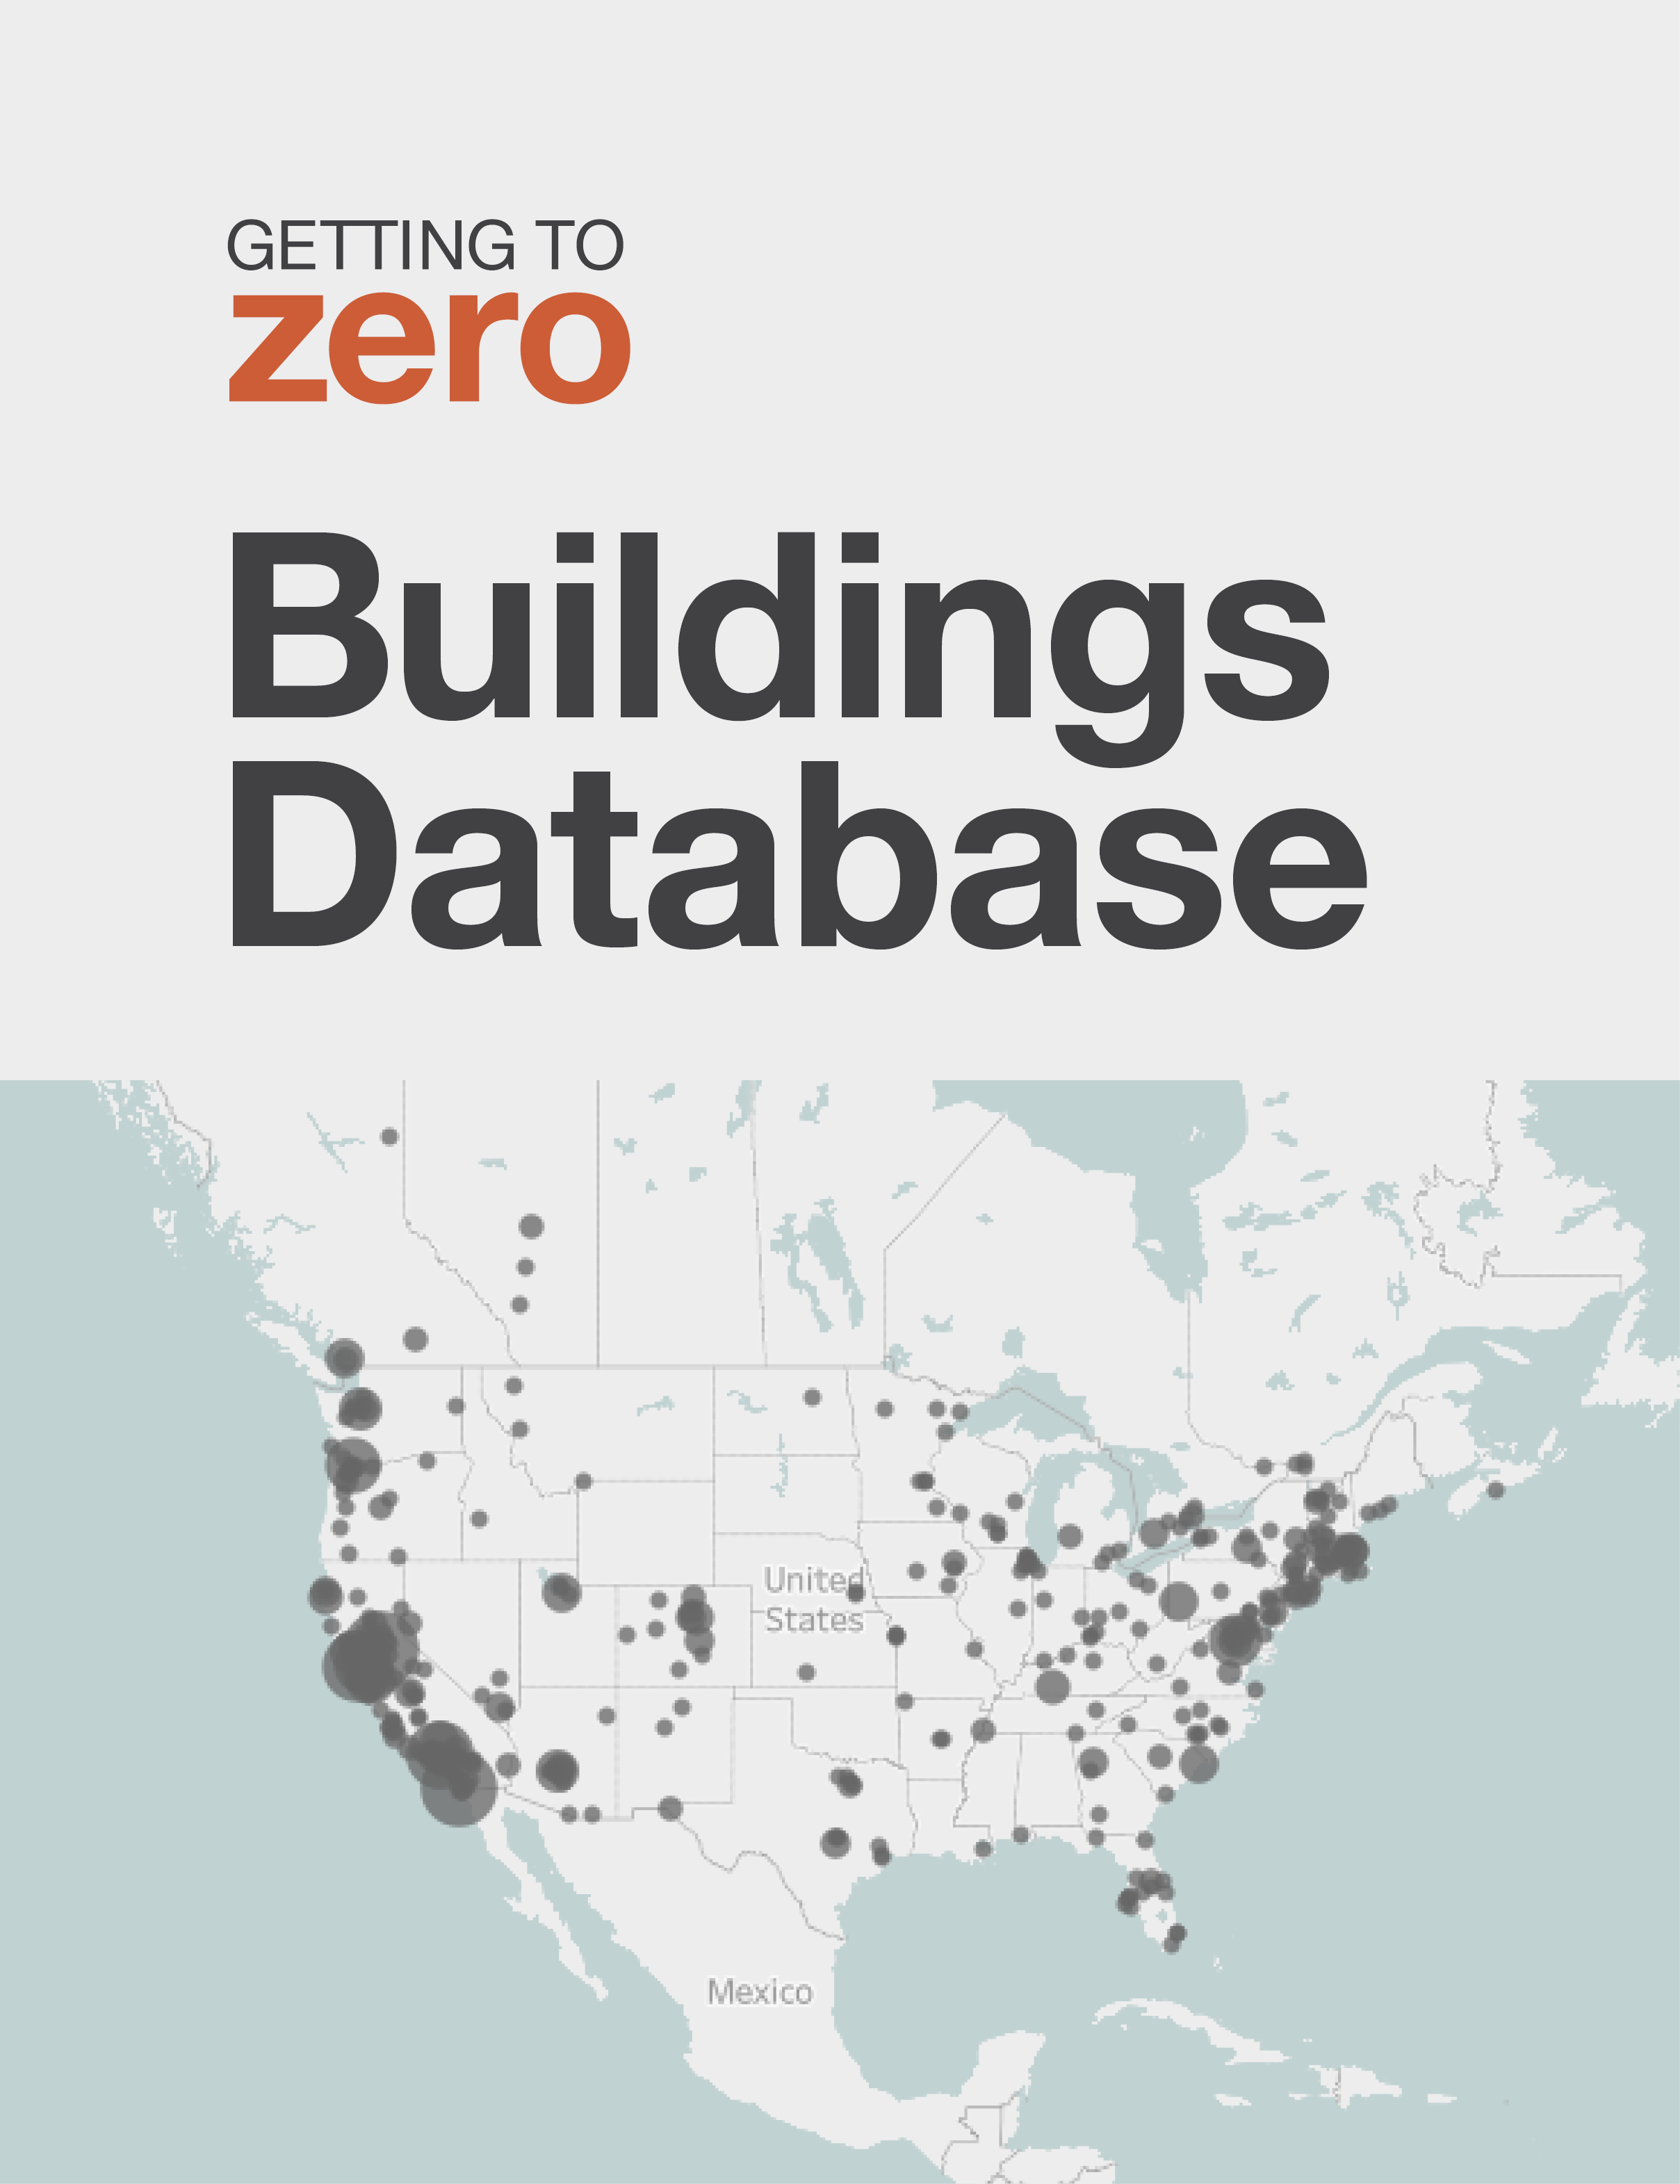 Getting to Zero Buildings Database